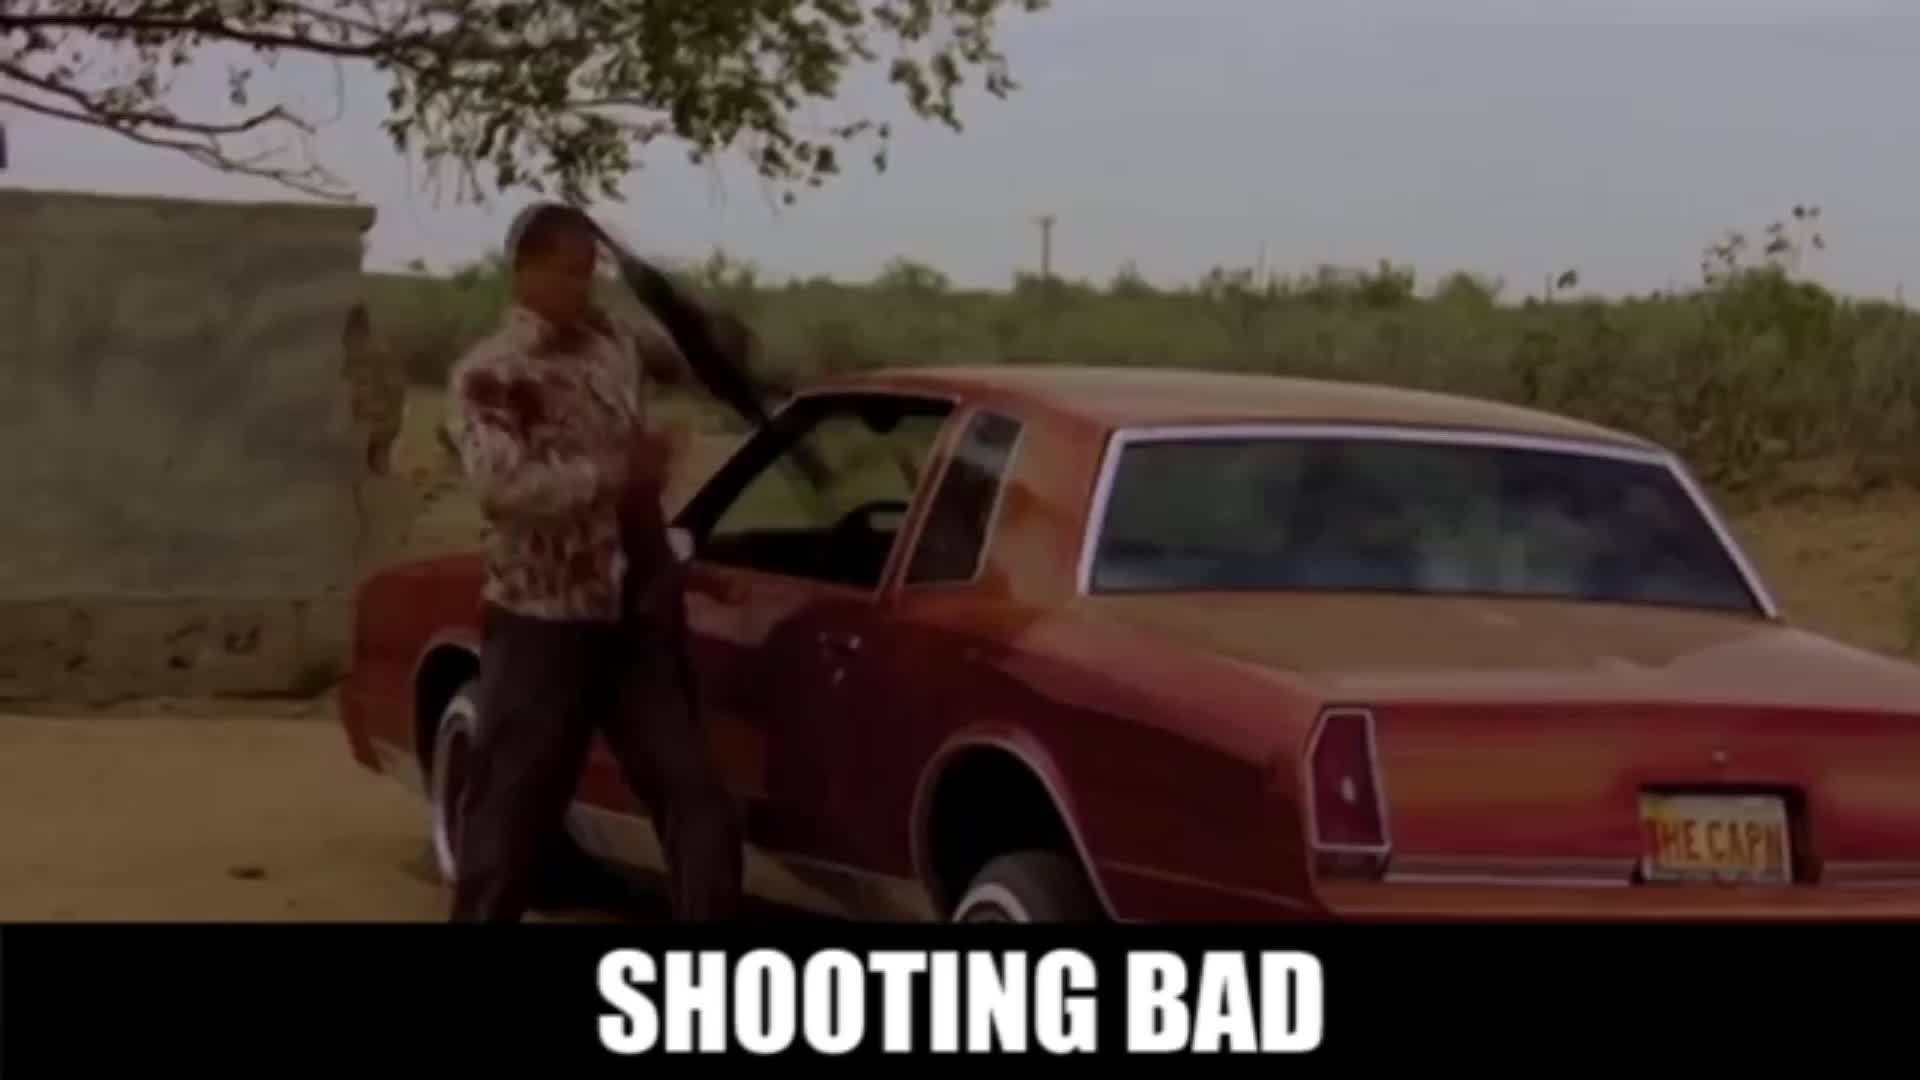 Shooting, actuallyfunny, breakingbad, Shooting bad GIFs